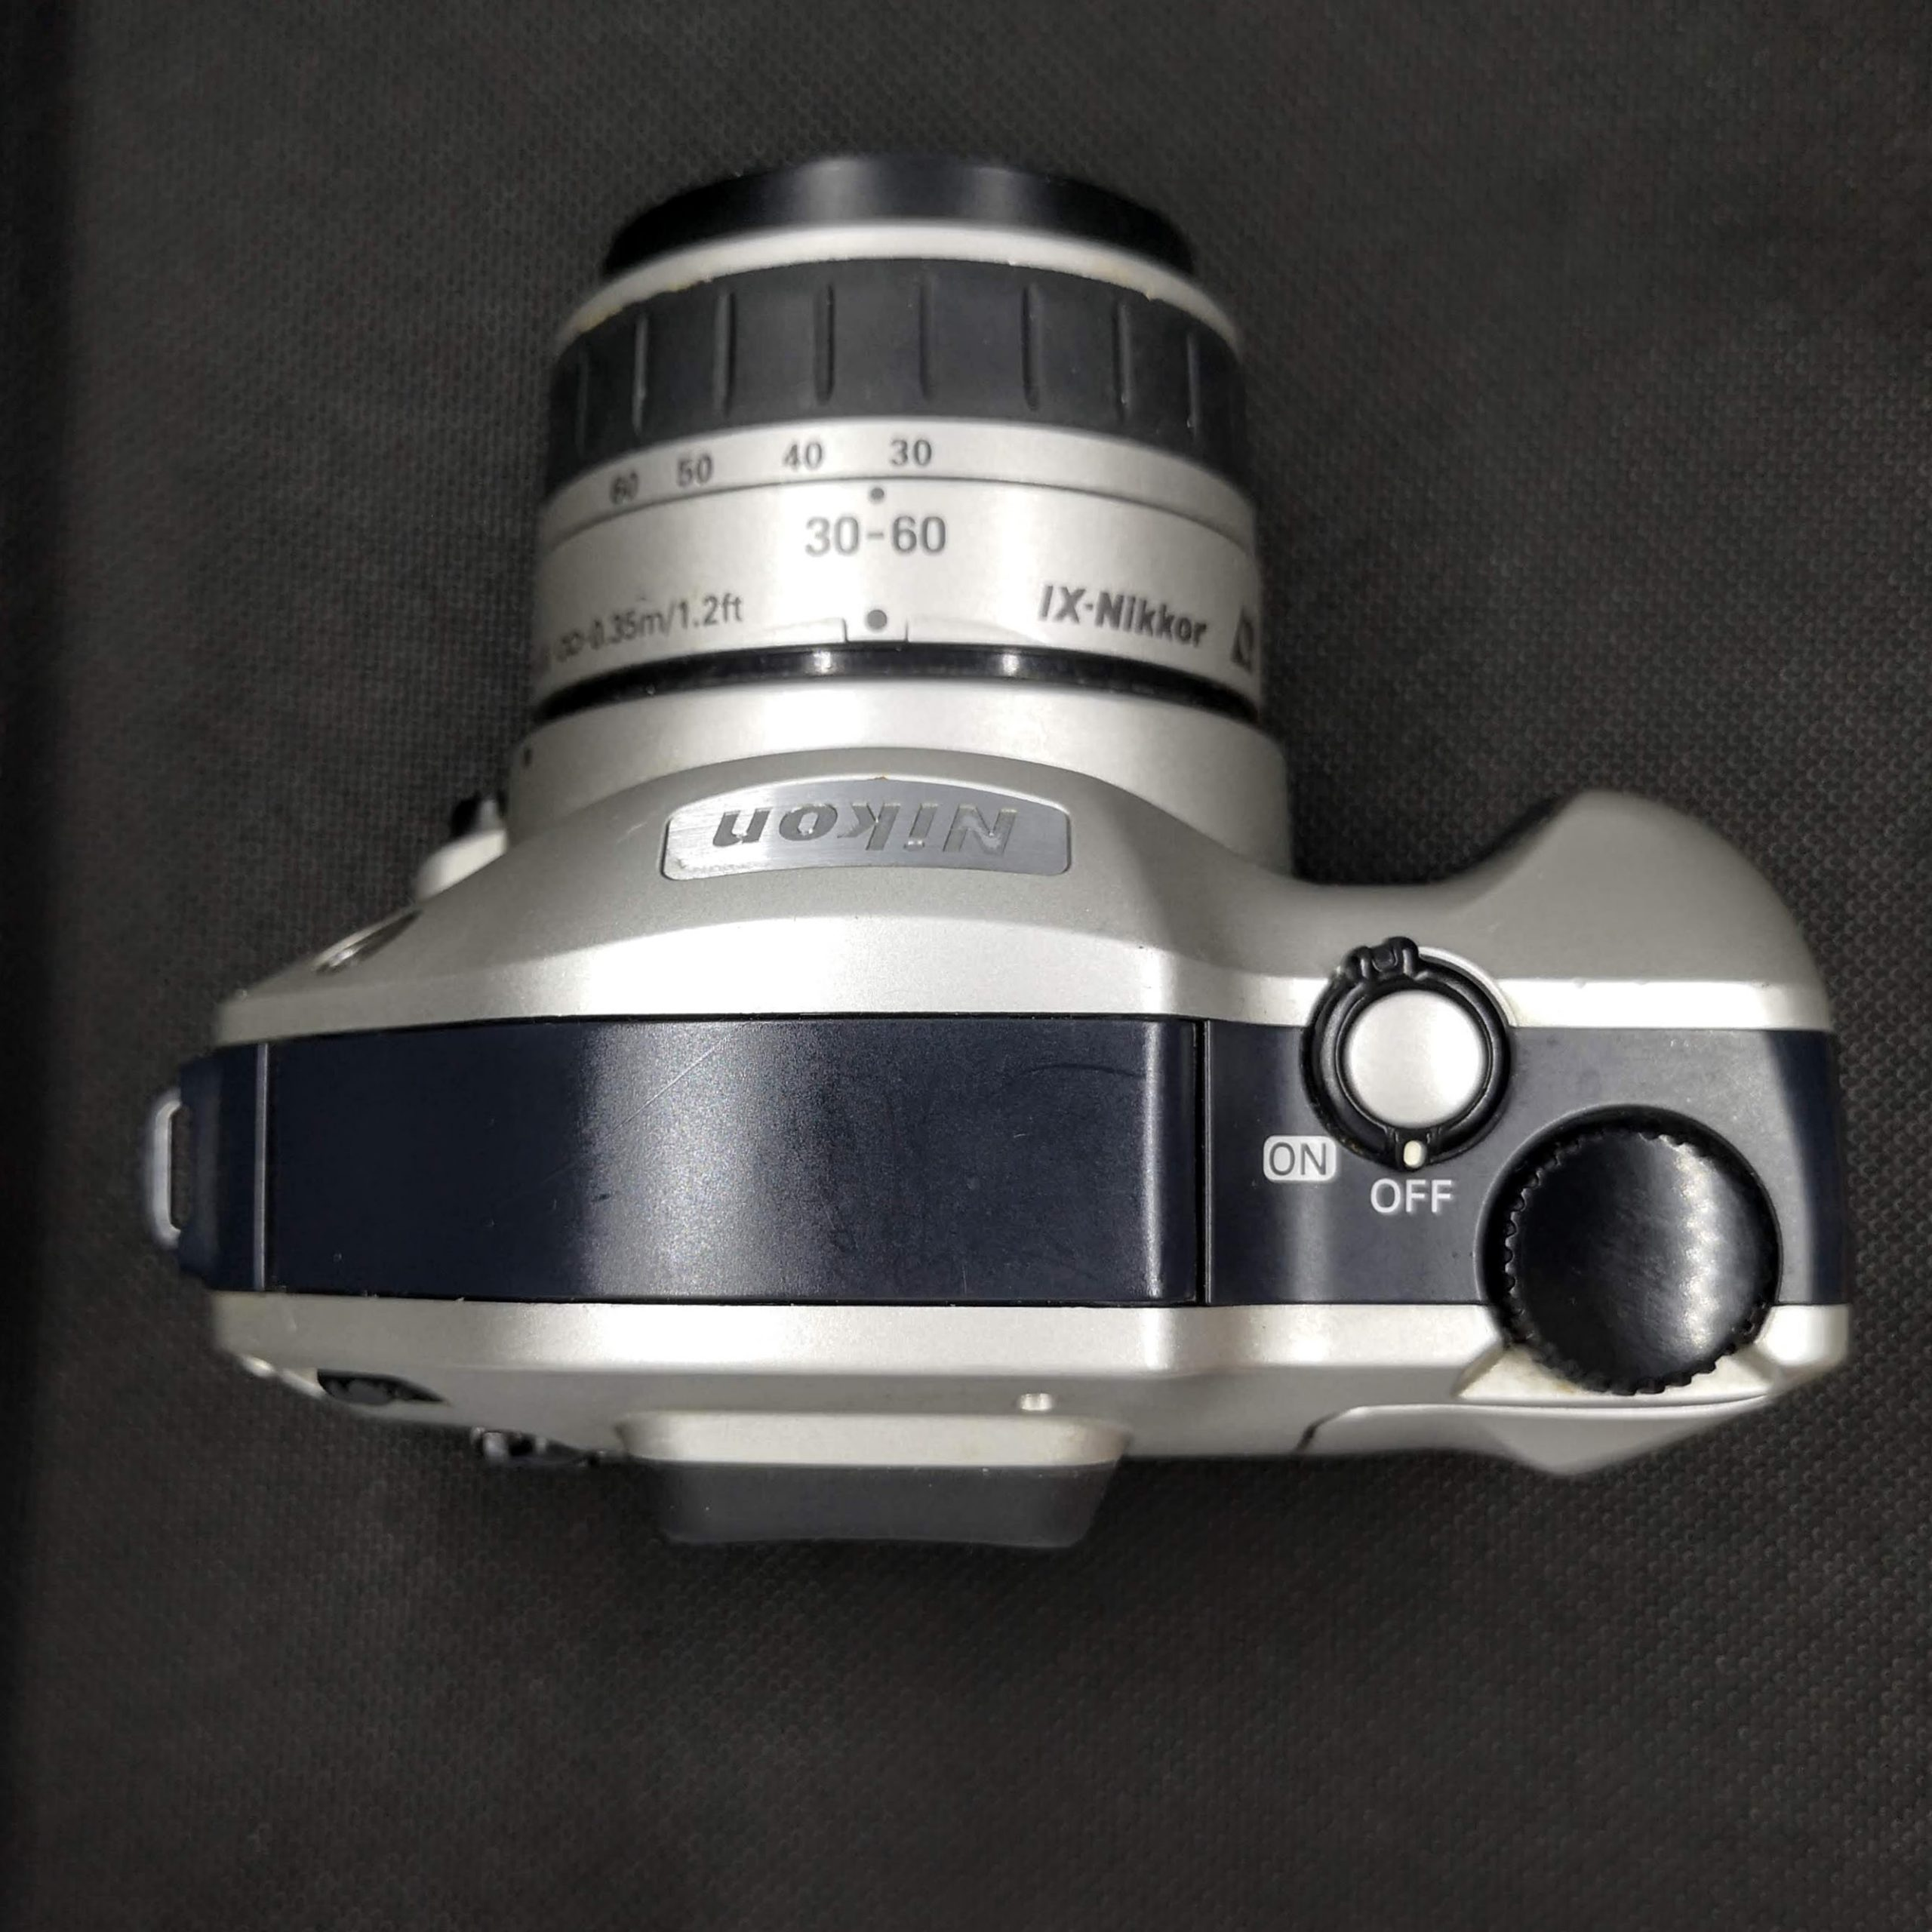 Top View of Nikon Pronea S with IX-Nikkor 30-60mm